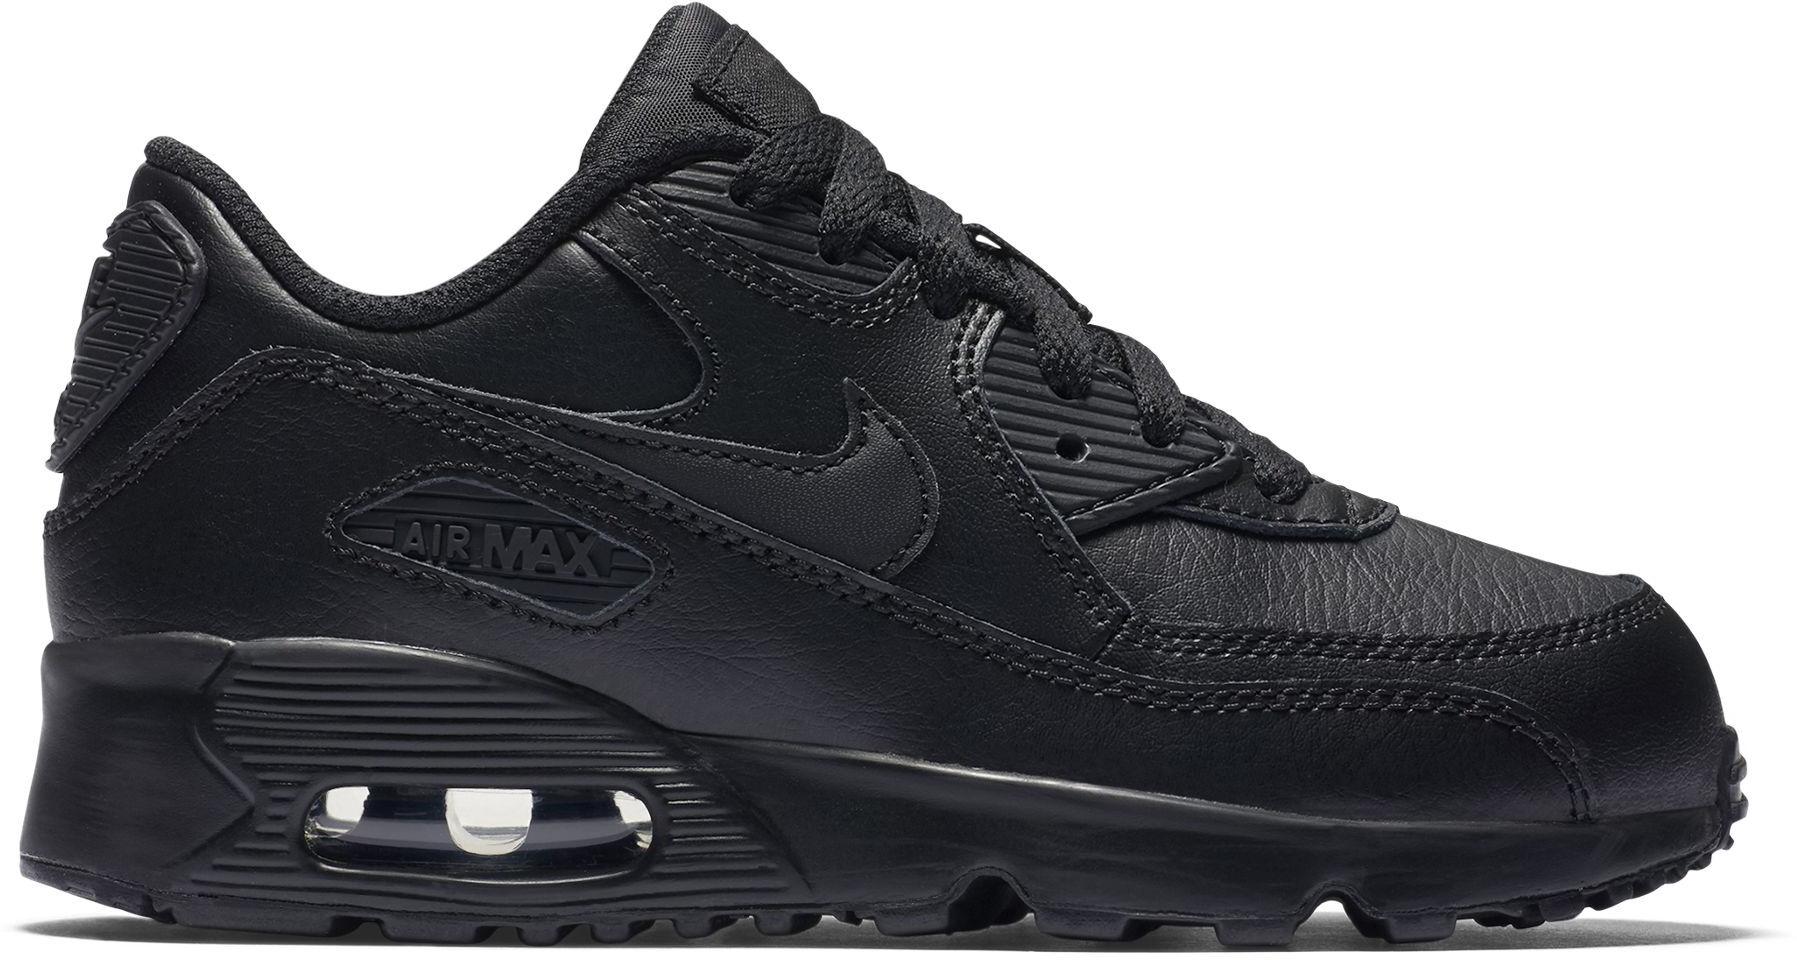 nike airmax schoenen zwart